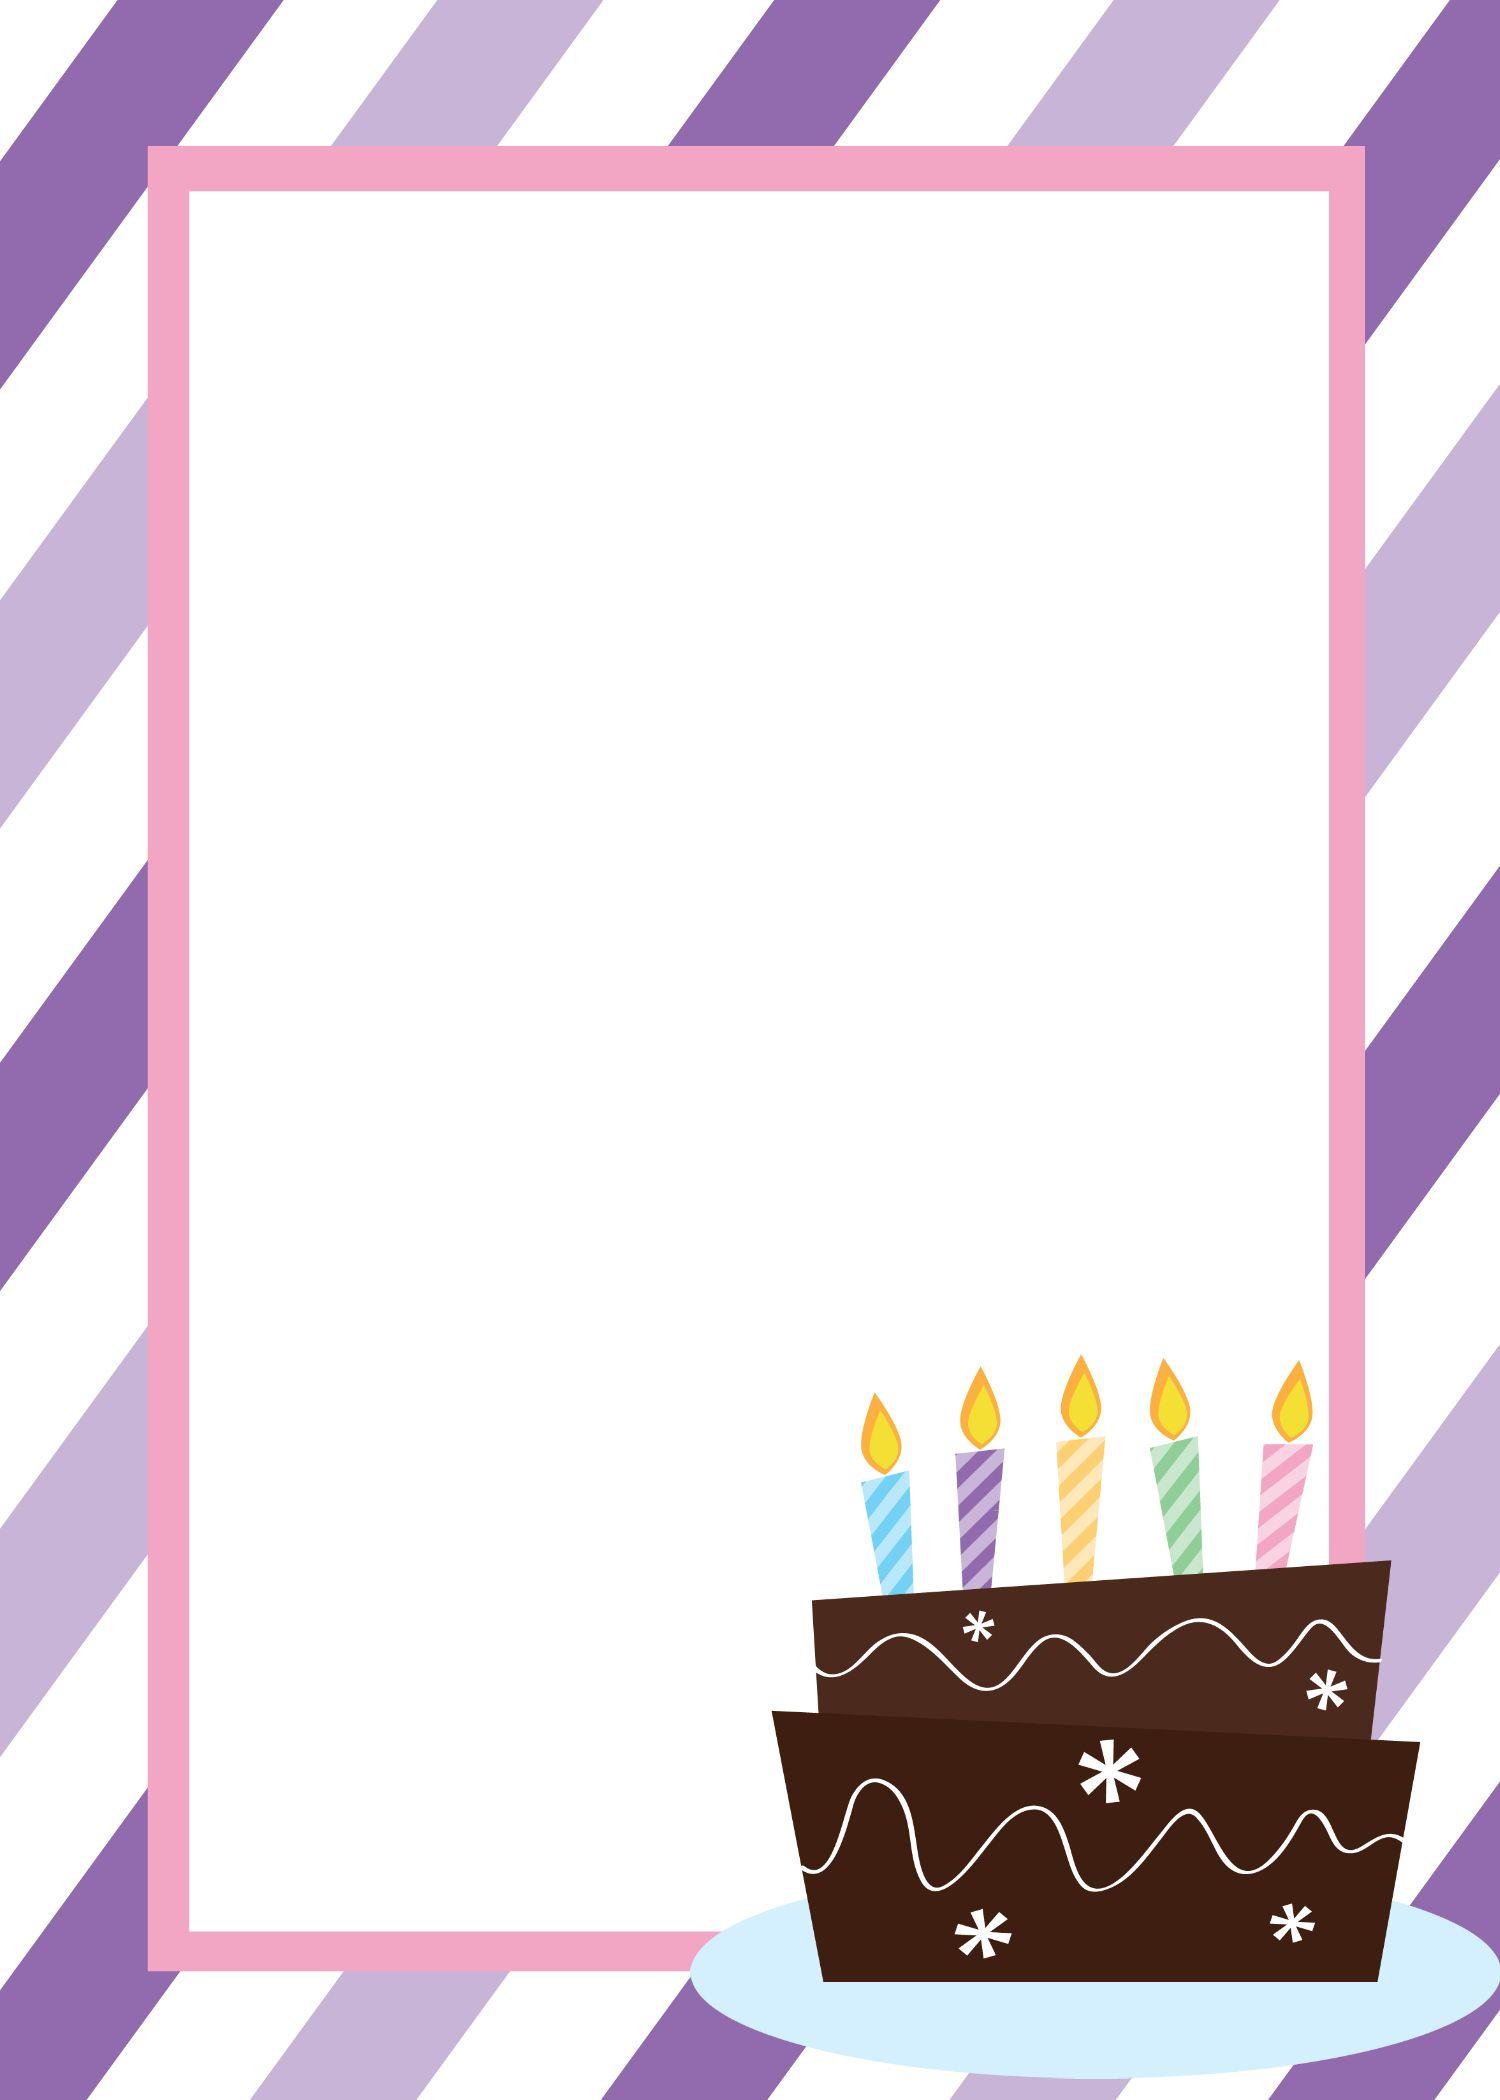 Free Printable Birthday Invitation Templates Create Birthday Invitations Party Invite Template Free Party Invitation Templates